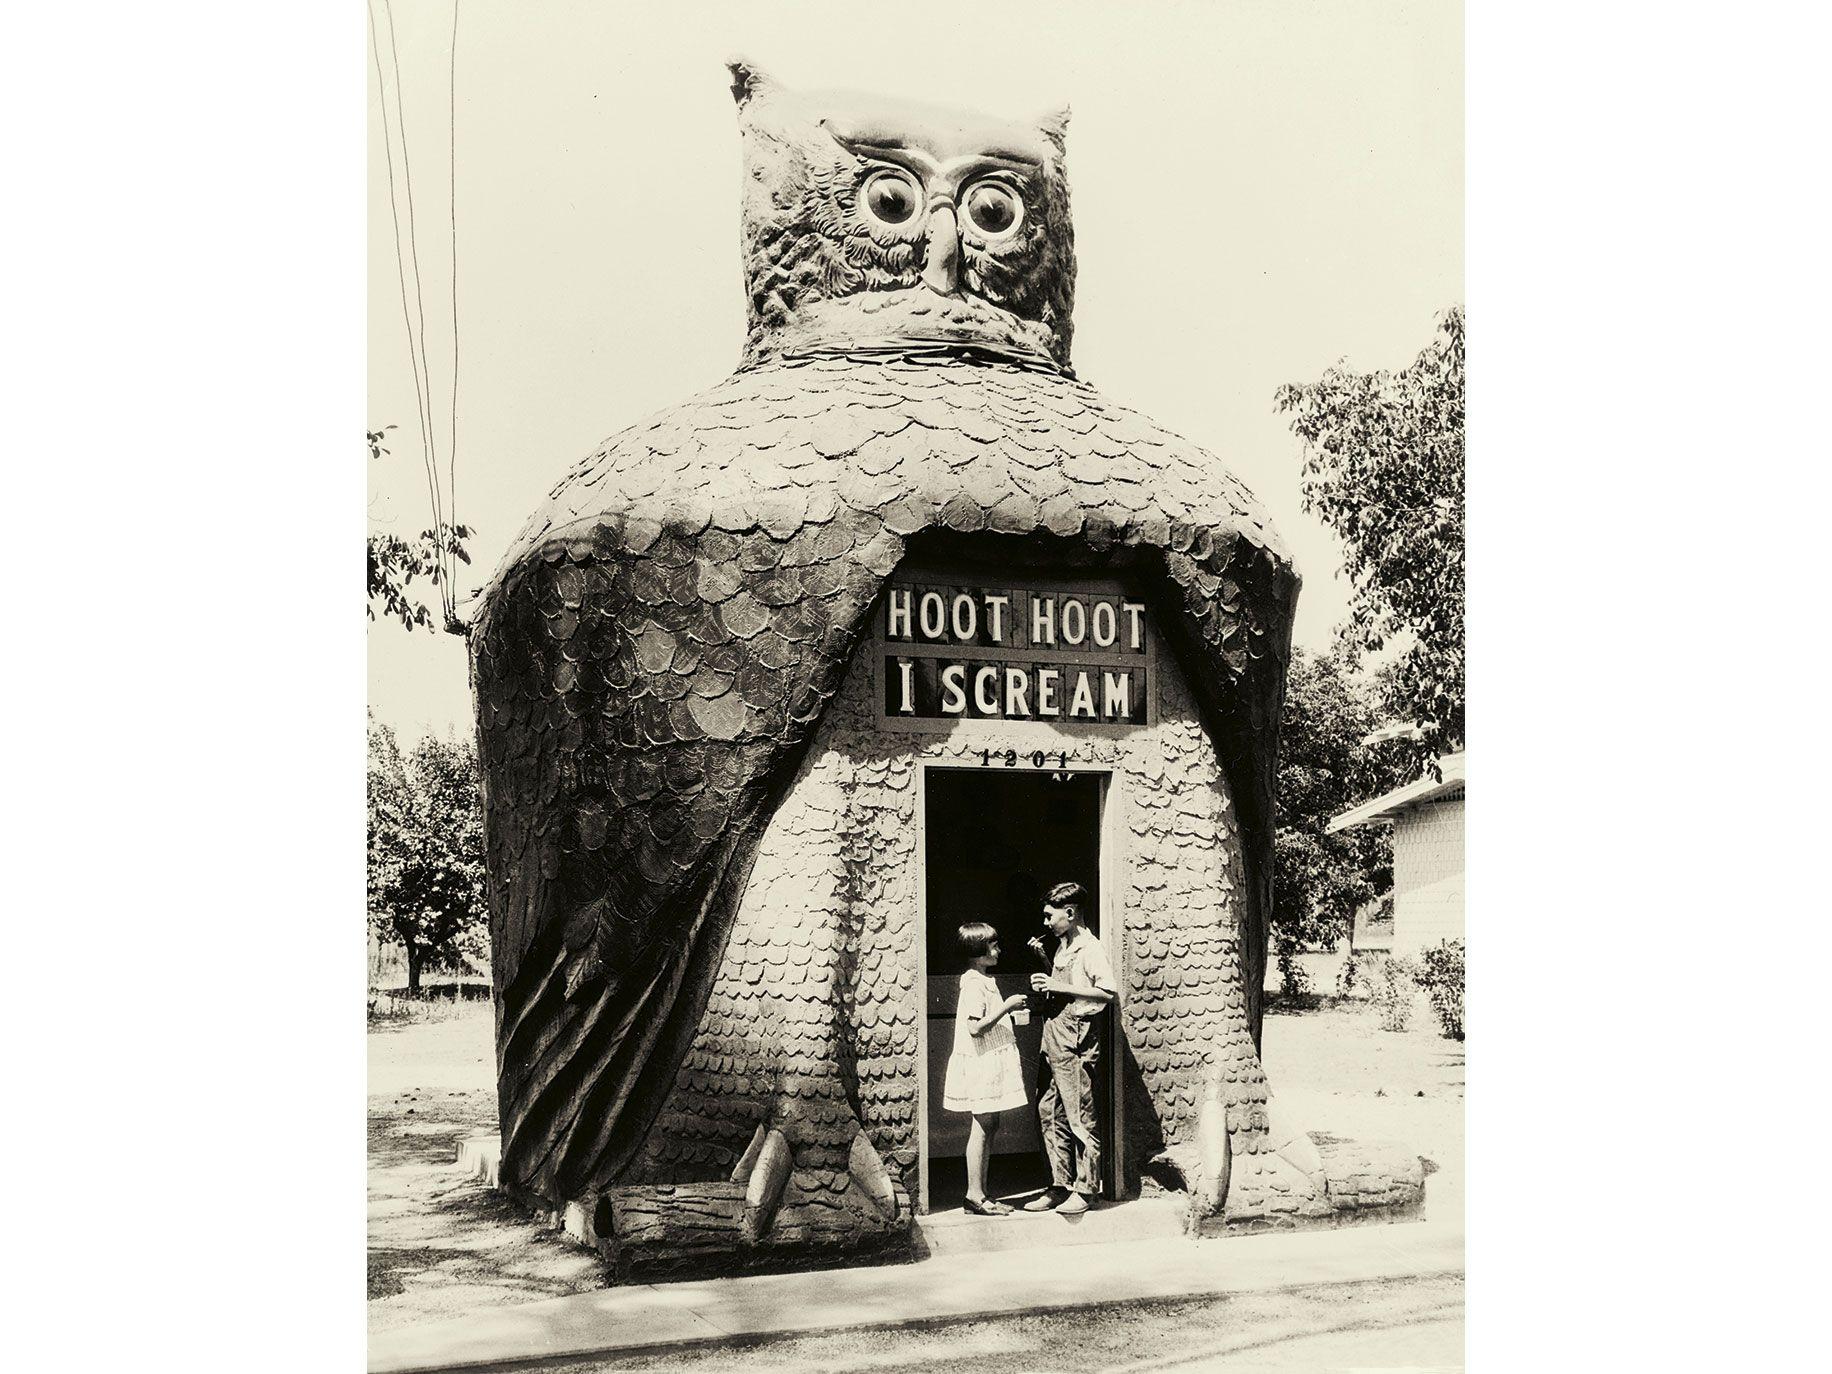 Hoot Hoot I Scream in San Gabriel (circa 1932).